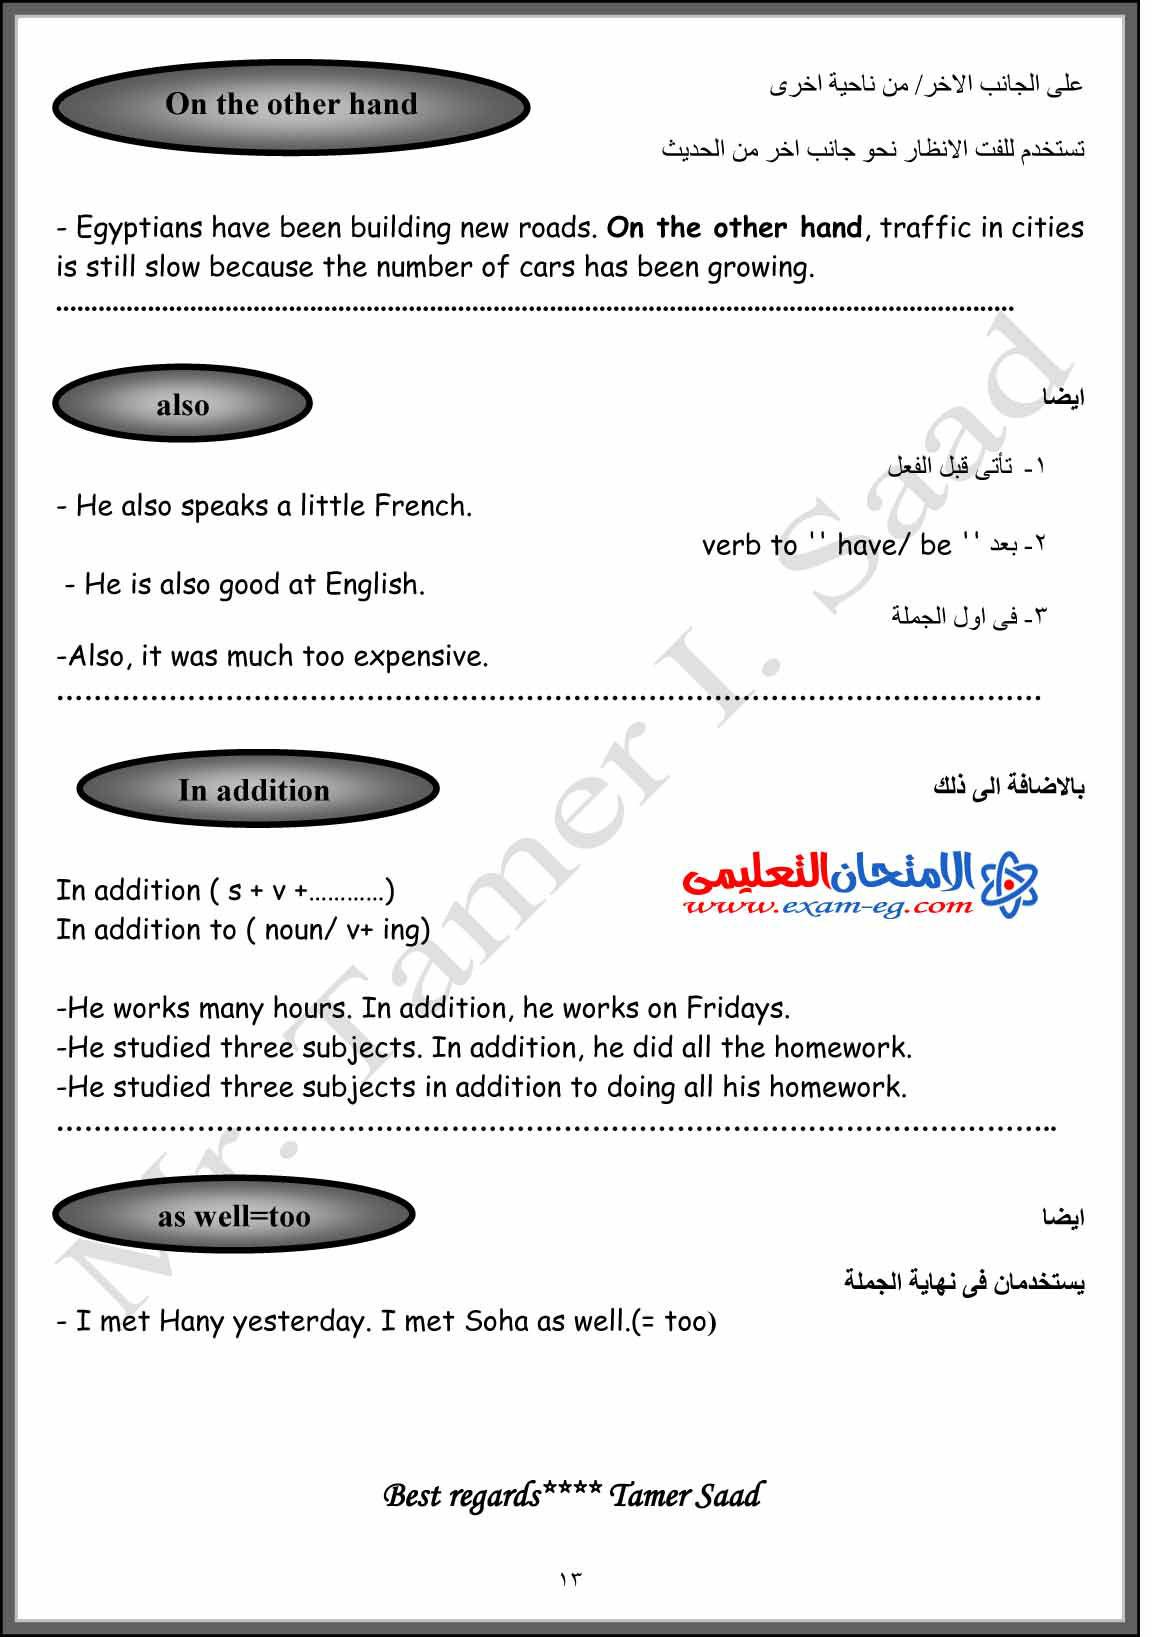 exam-eg.com_14428452403913.jpg